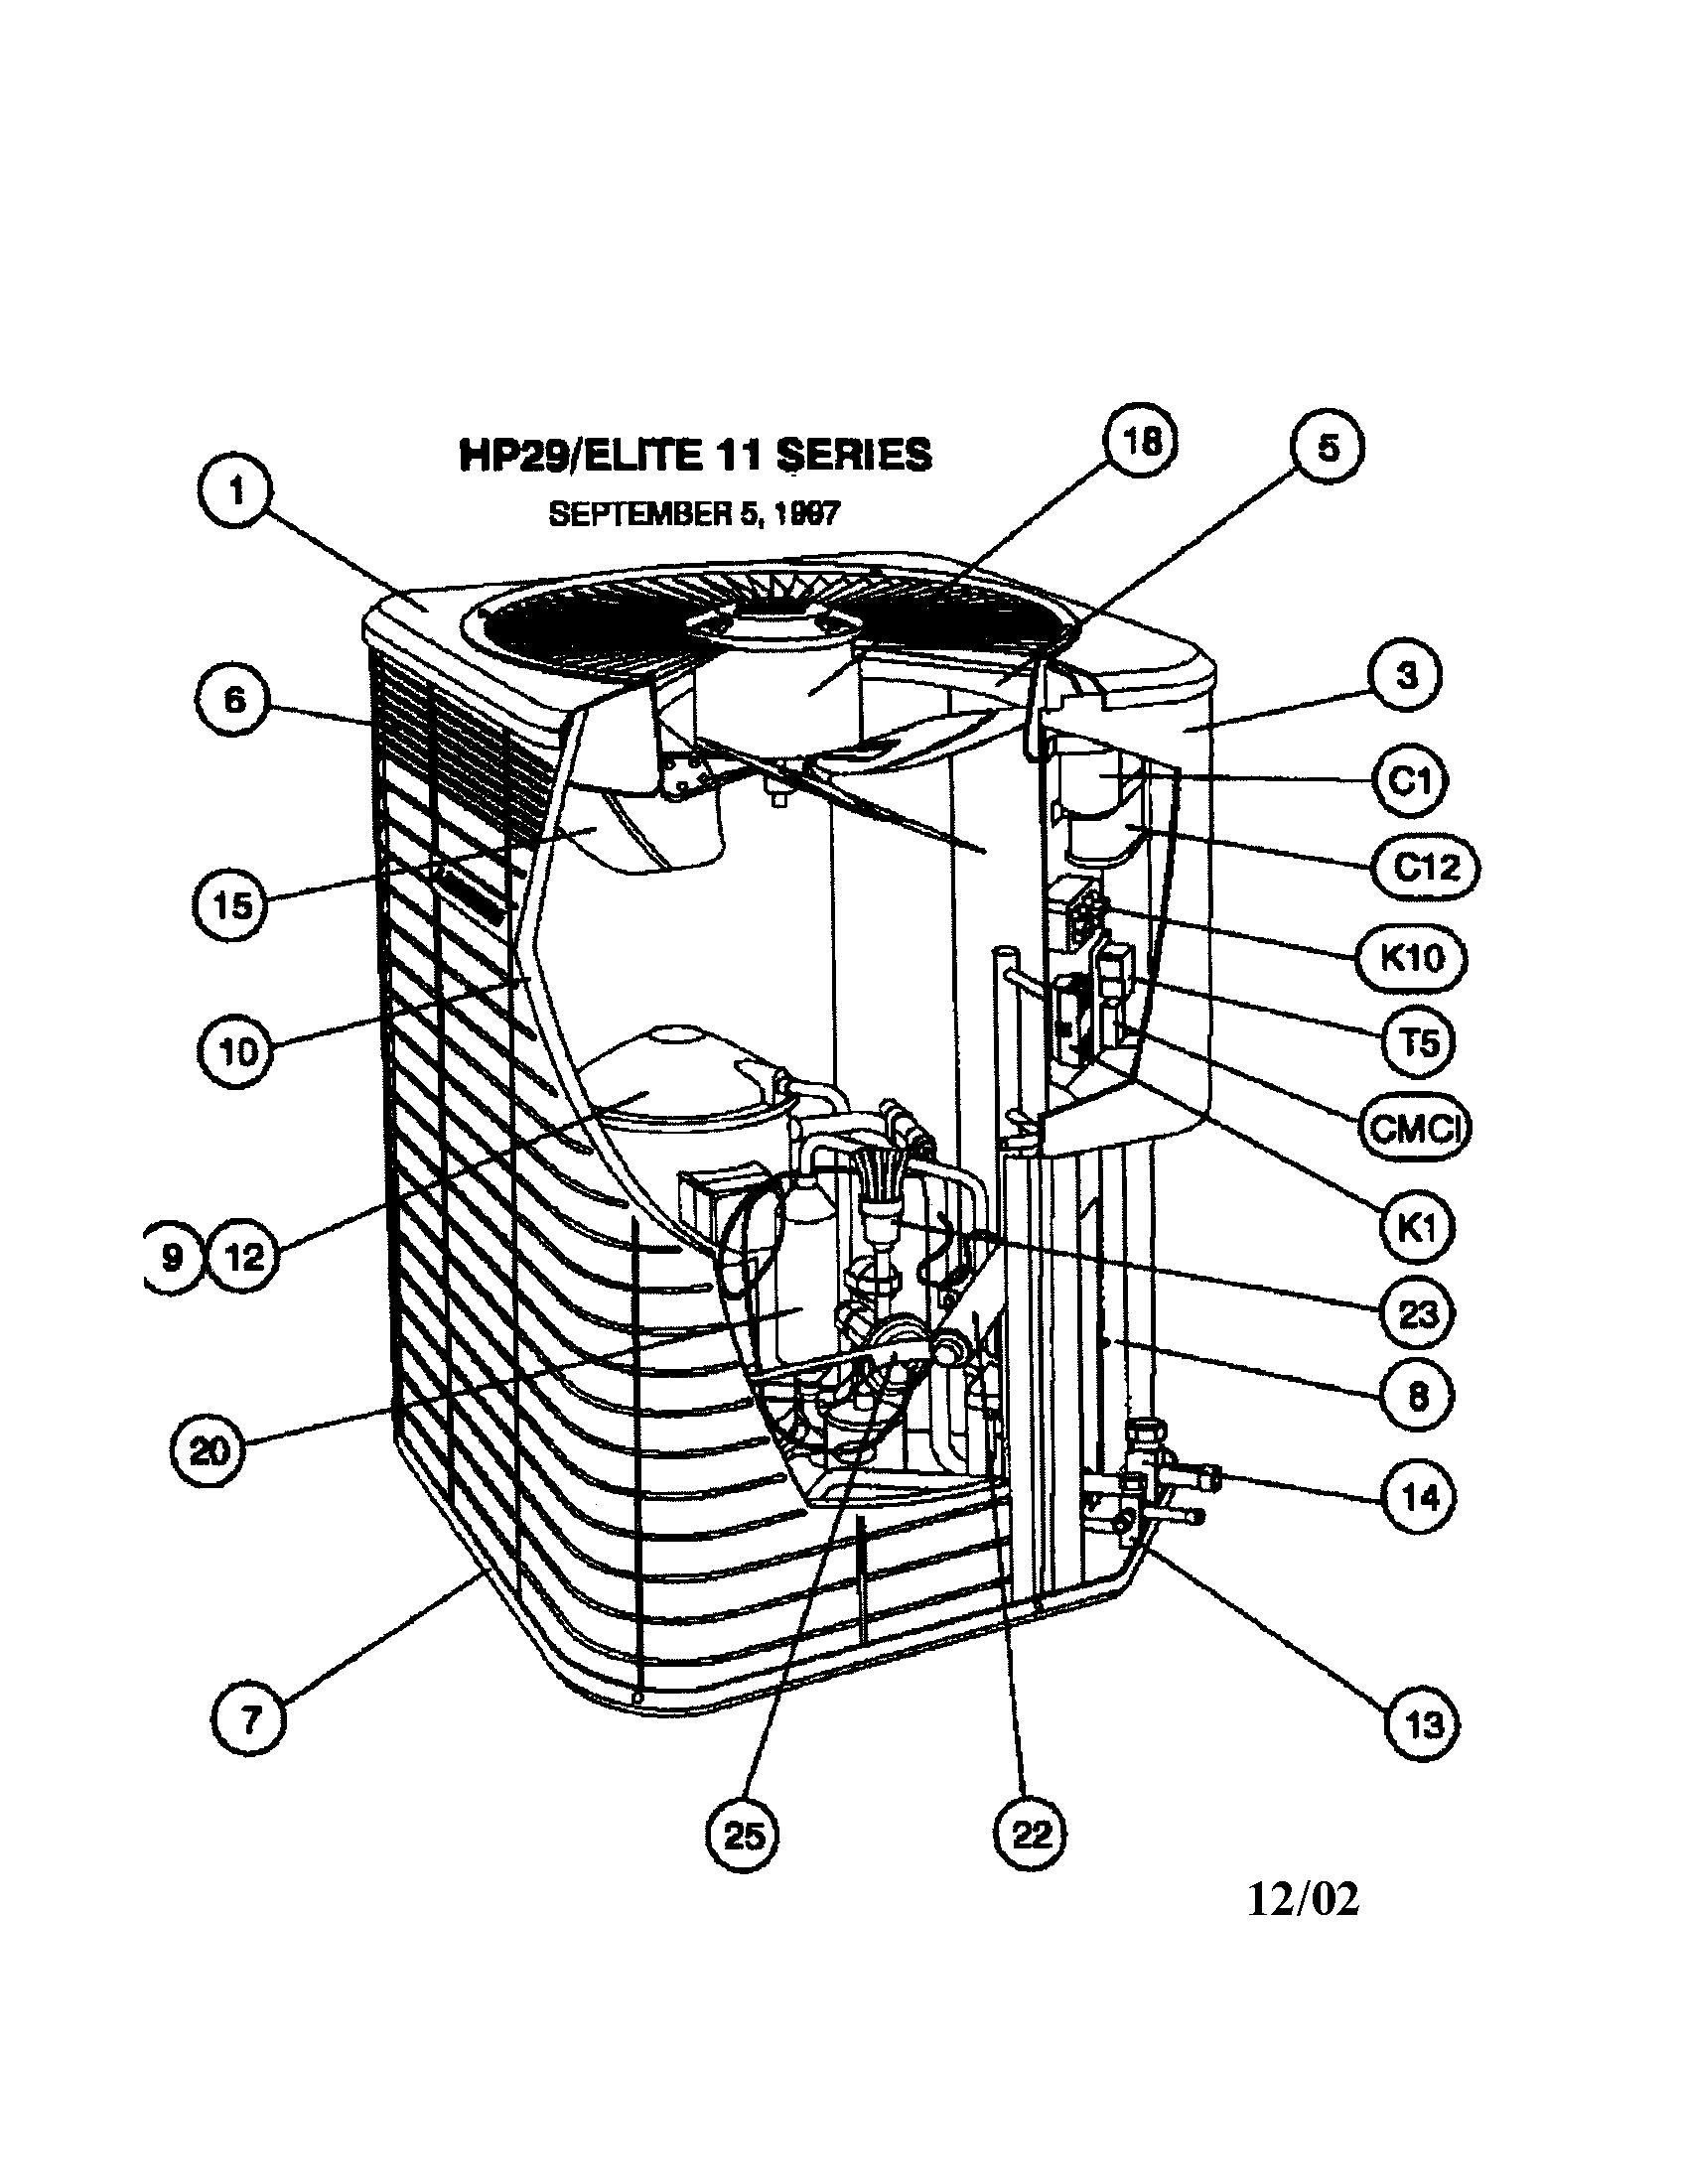 hight resolution of lennox model hp29 048 1p air conditioner heat pump outside unit rh searspartsdirect com ac unit parts diagram ac unit schematics